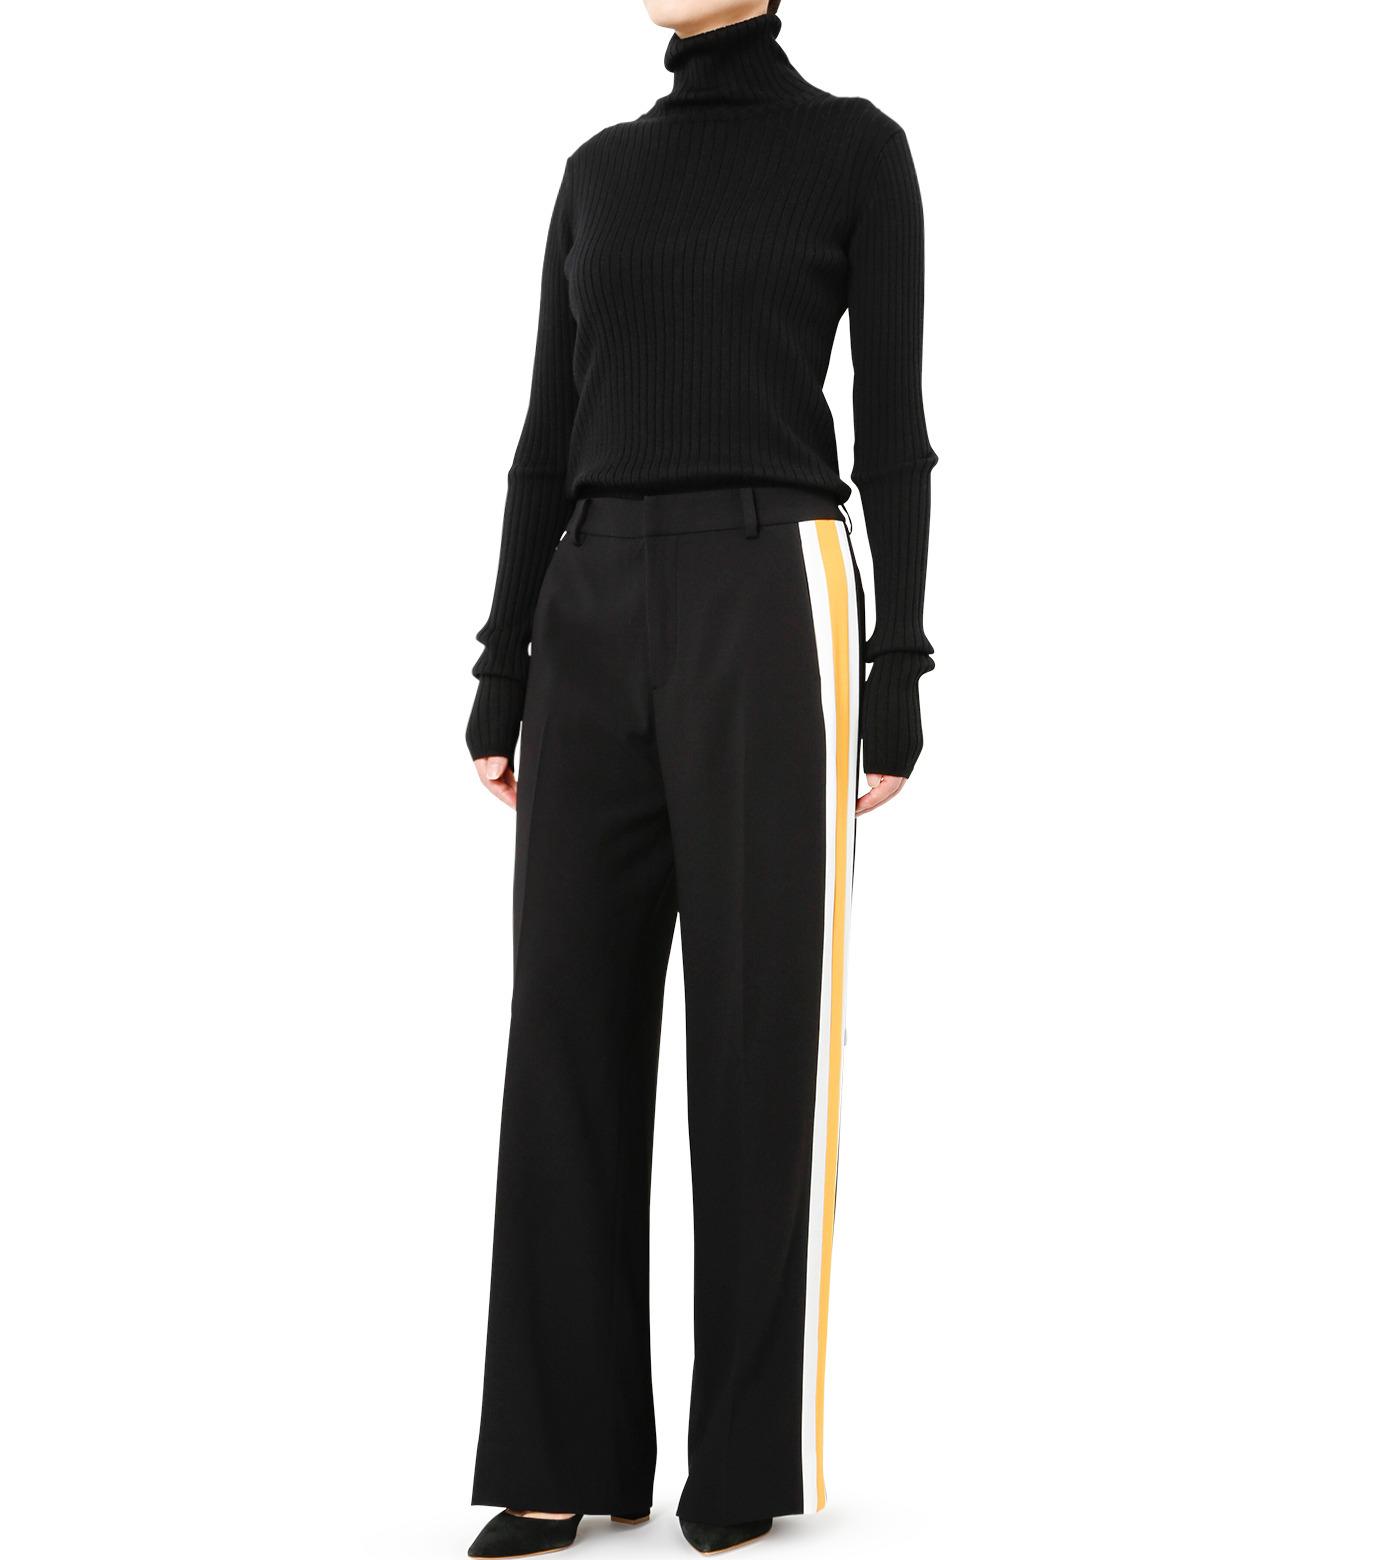 LE CIEL BLEU(ルシェルブルー)のトラックワイドパンツ-BLACK(パンツ/pants)-19S68103 拡大詳細画像2